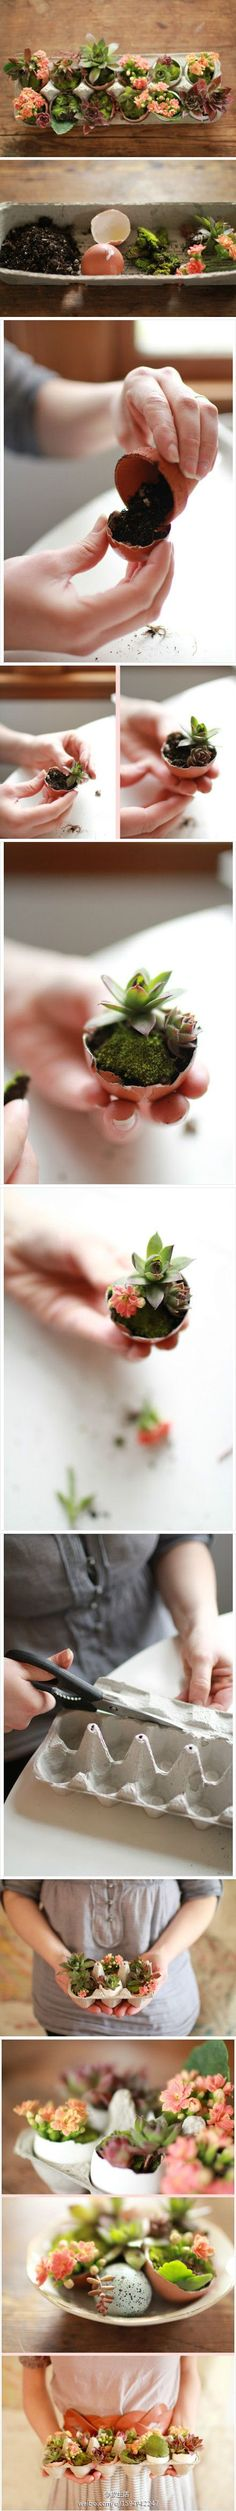 succulents in egg shells.